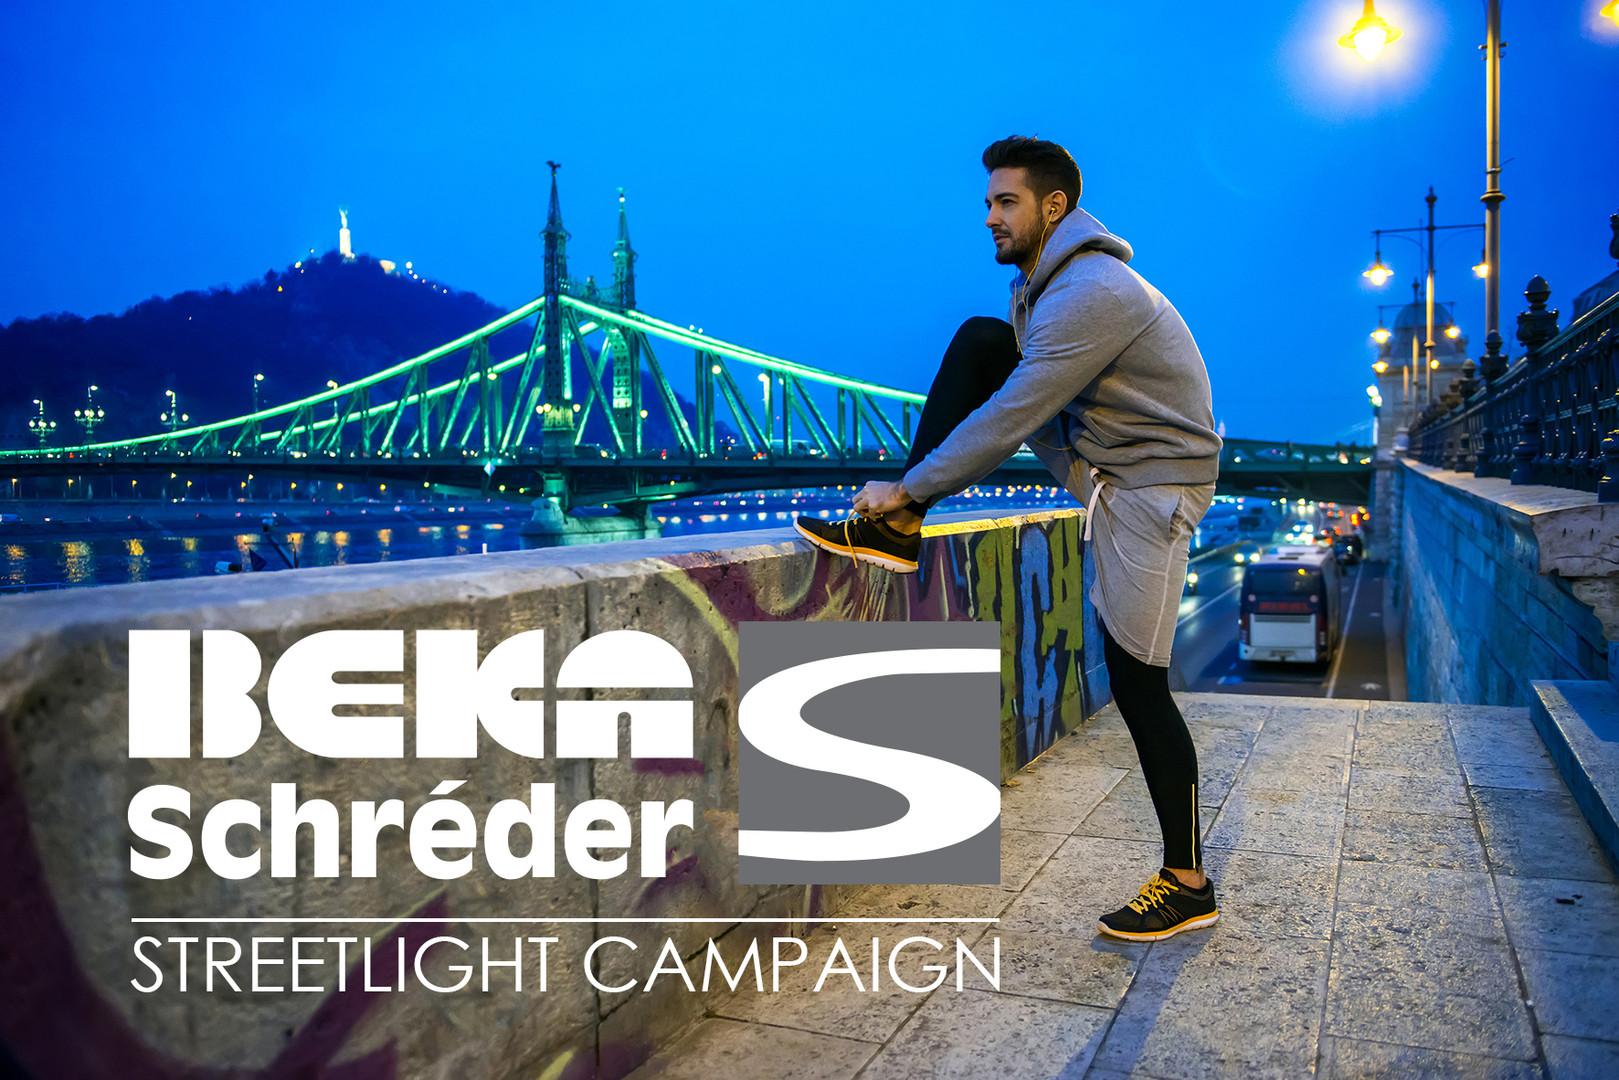 BEKA Schreder - Streetlight Campaign